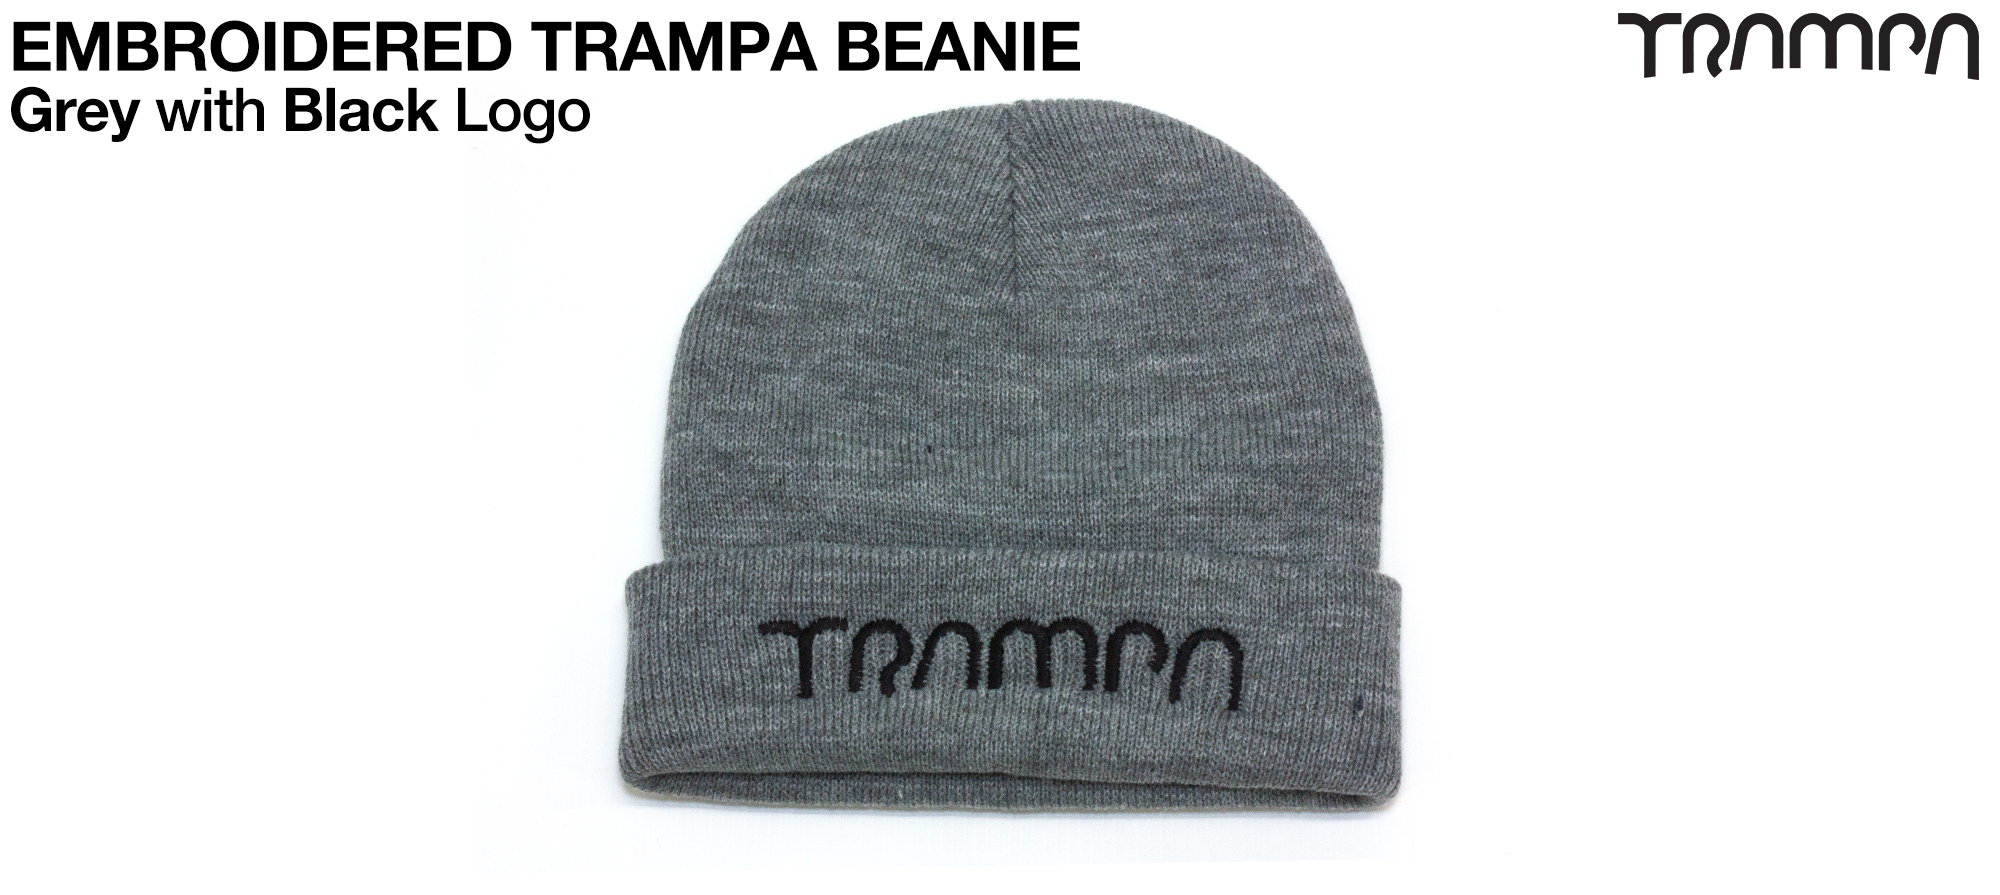 Grey Woolie hat with Black TRAMPA logo